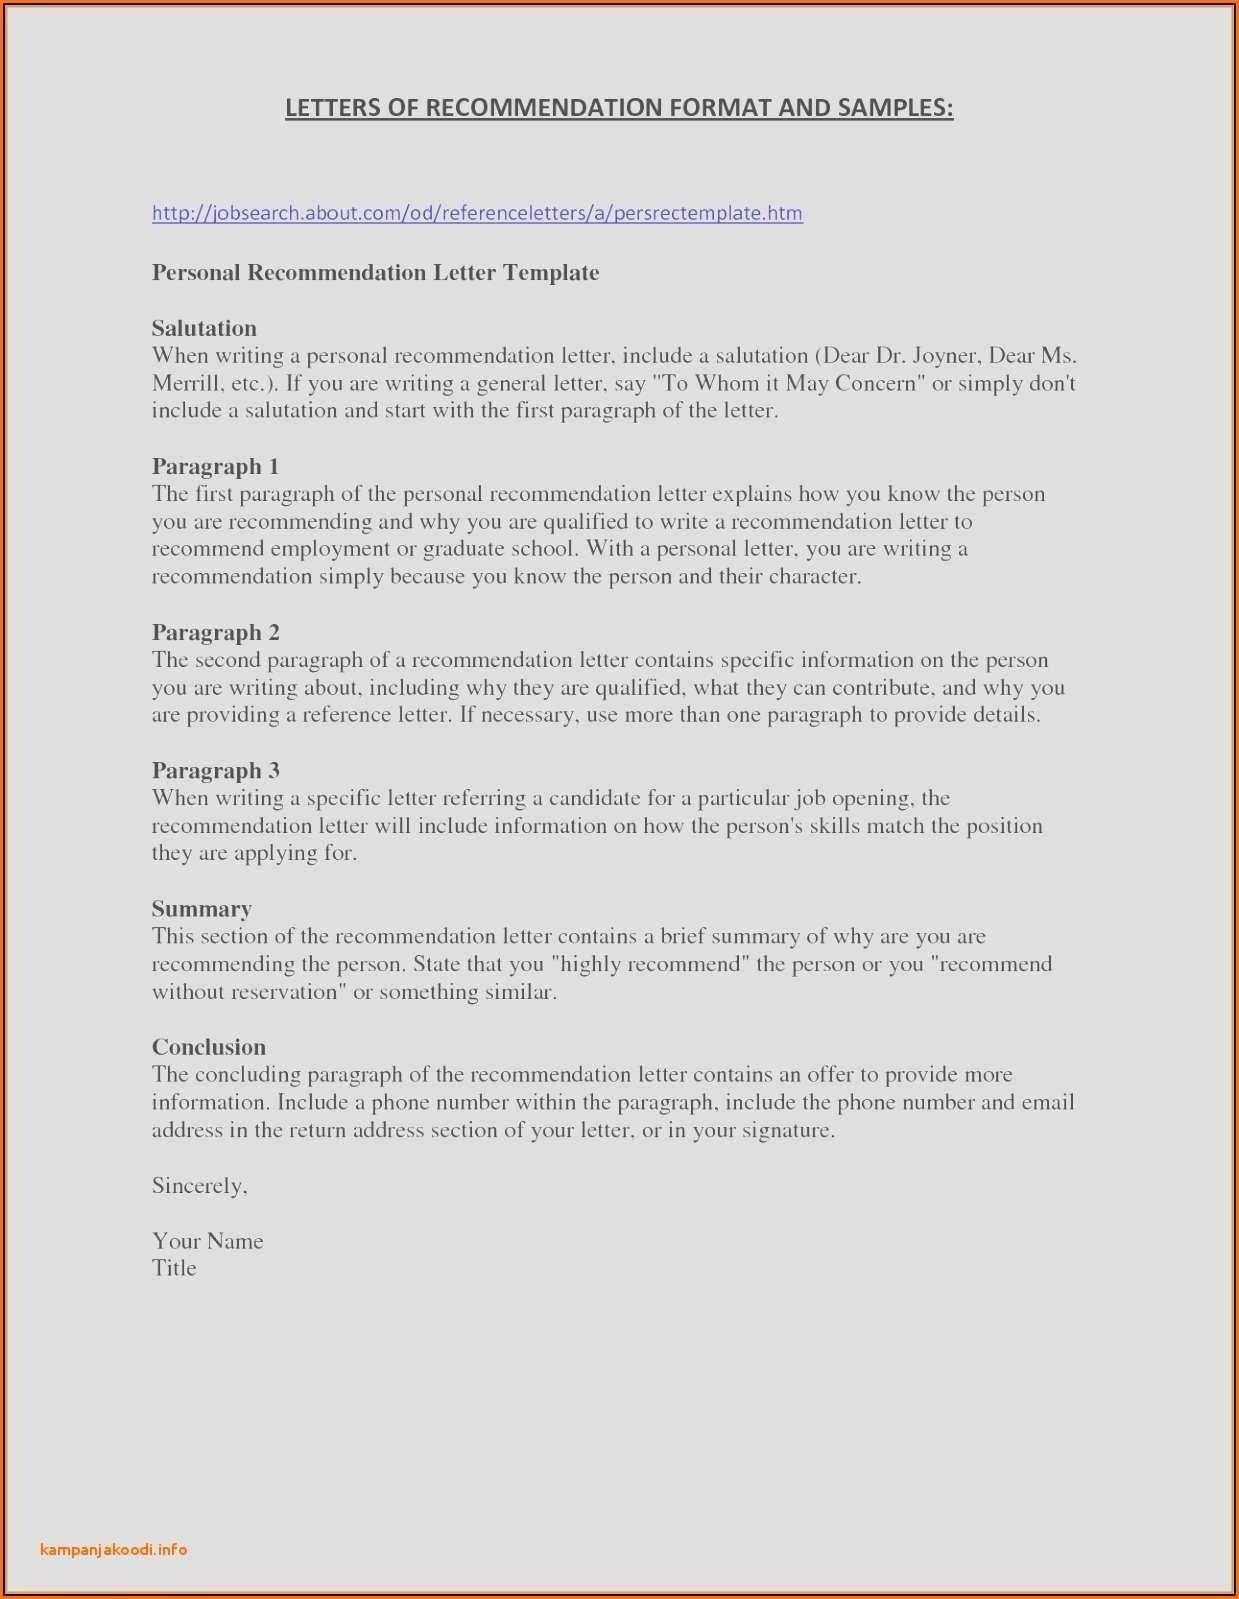 Social Worker Letter Of Recommendation Fresh New Example Letter Re Mendation social Worker